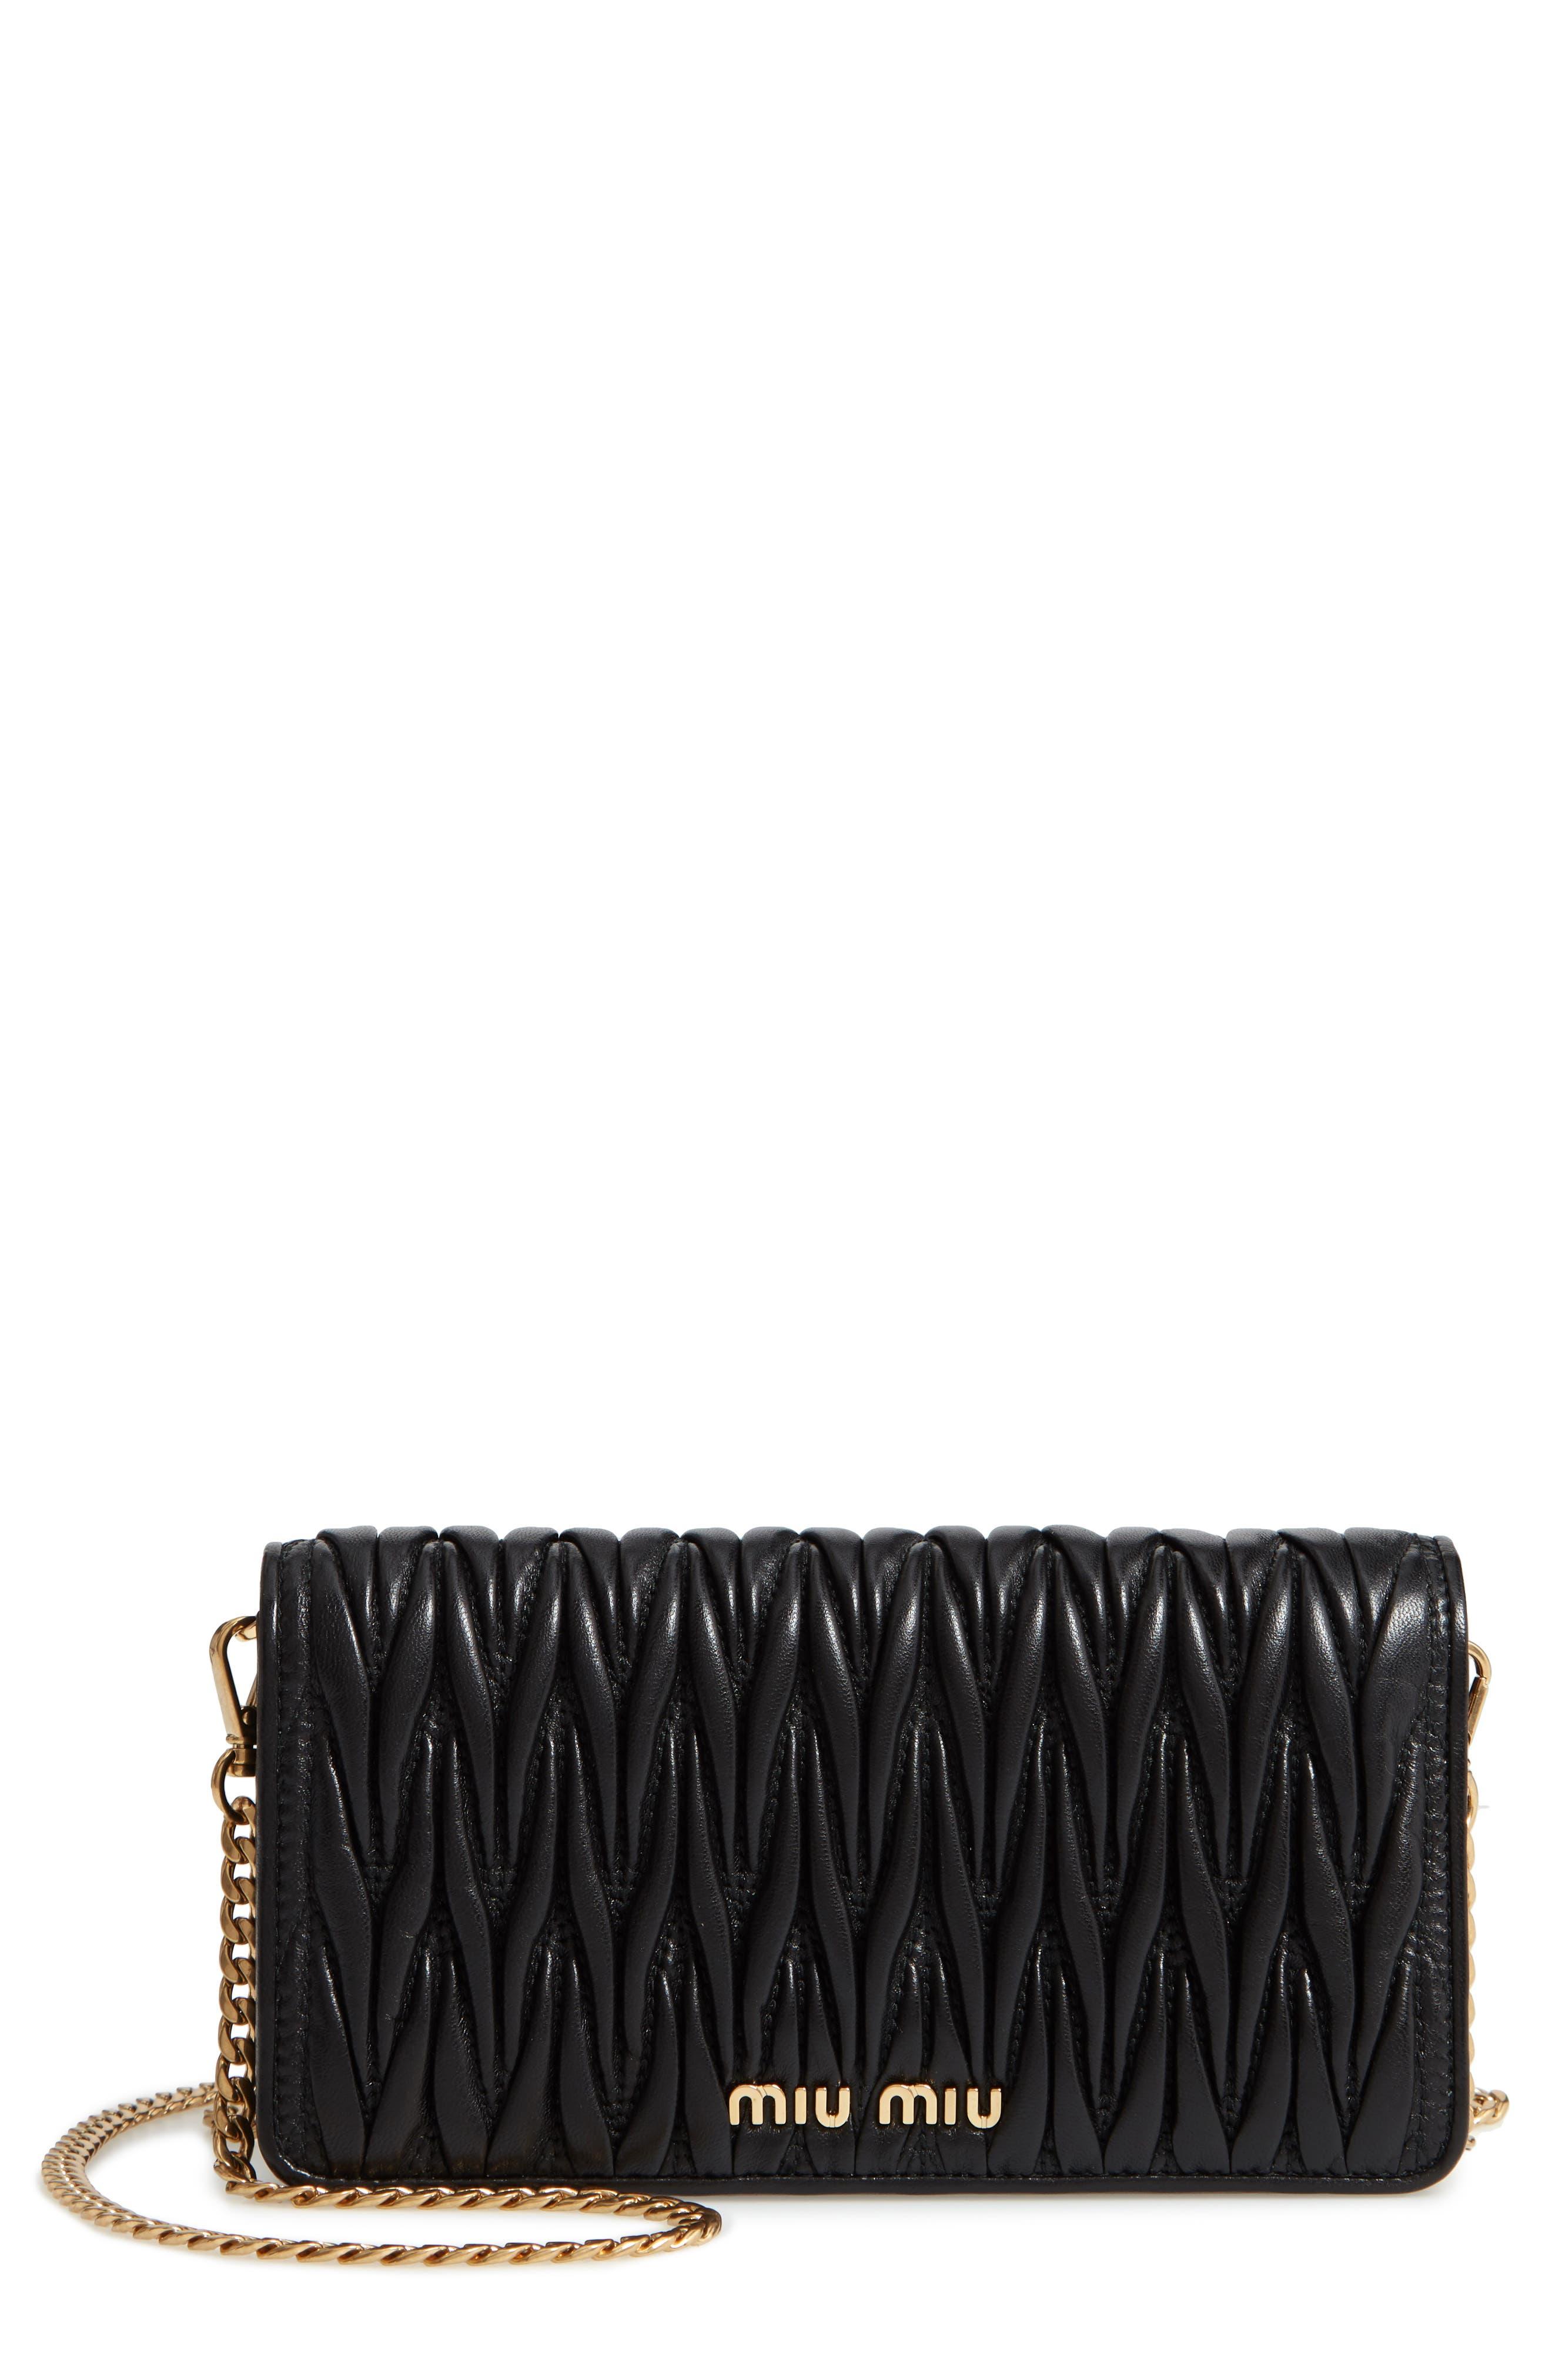 Miu Miu Matelassé Leather Wallet on a Chain   Nordstrom